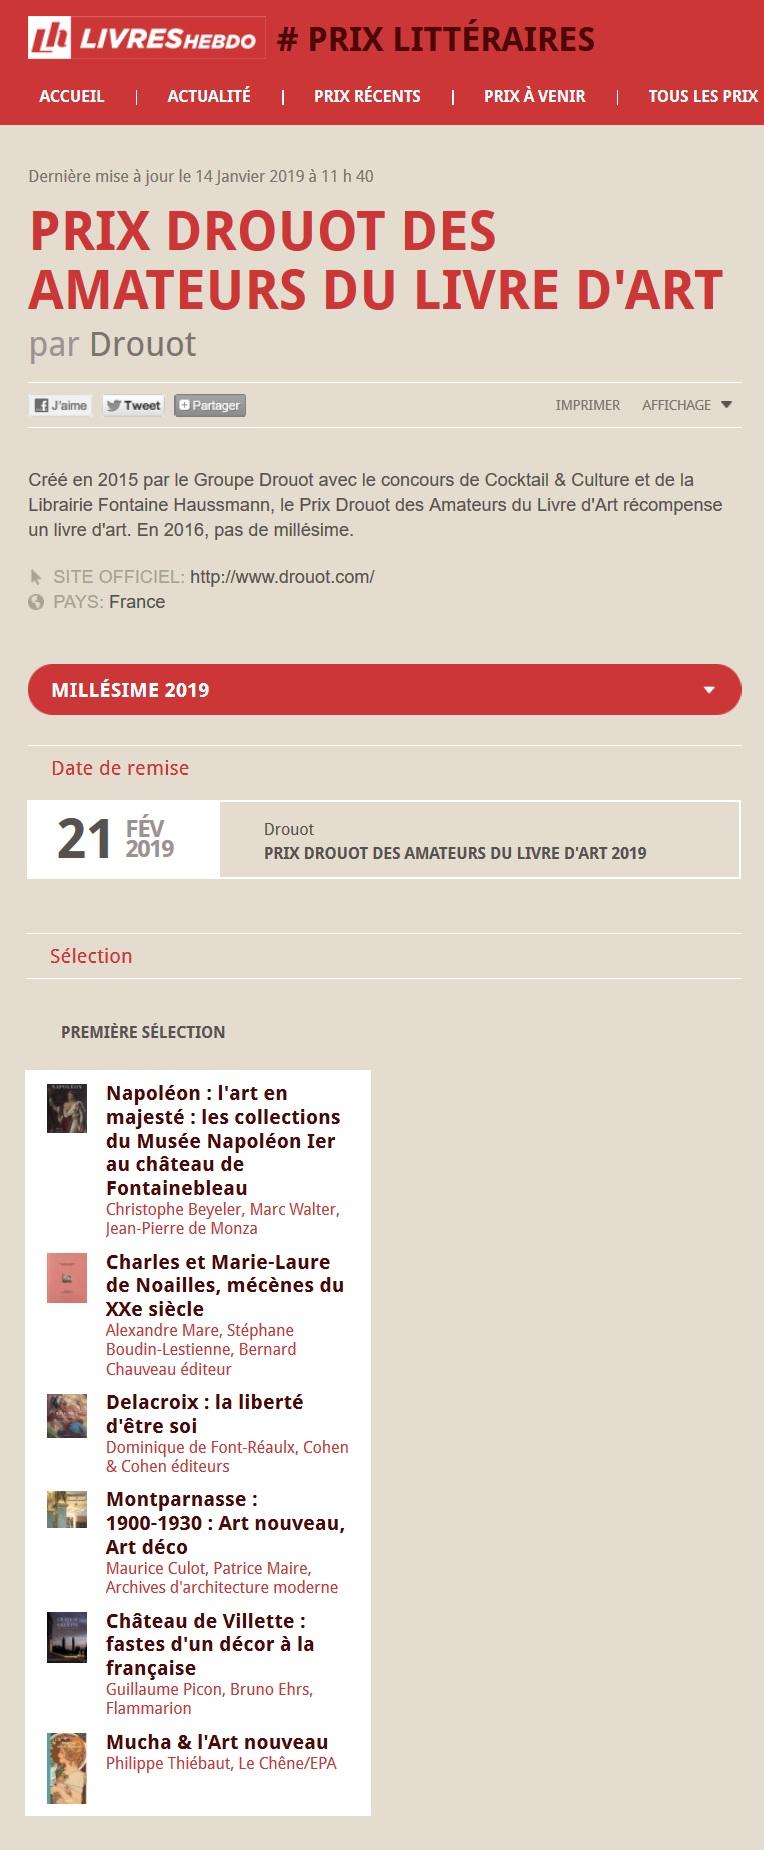 Article Livres Hebdo Finalistes Prix Drouot 2019